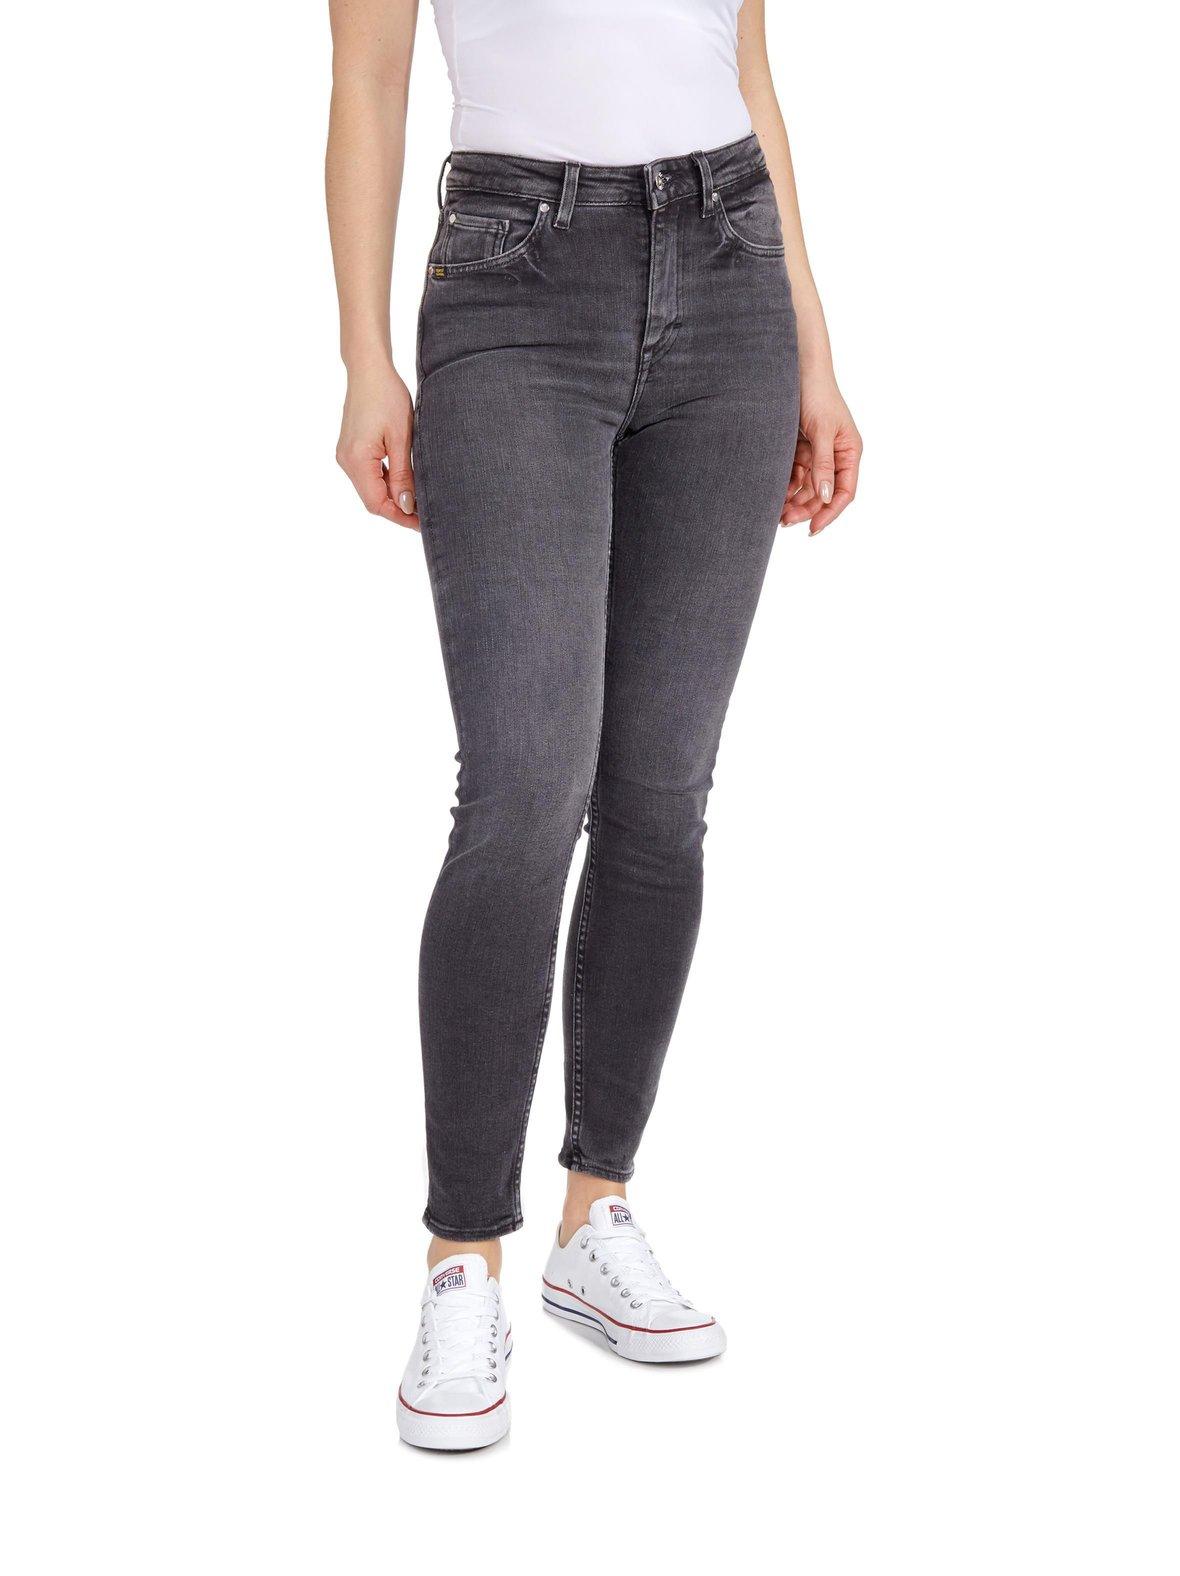 1f9e3ce6 Black Tiger of Sweden Jeans Shelly Jeans -farkut | 25 32* | Naiset ...